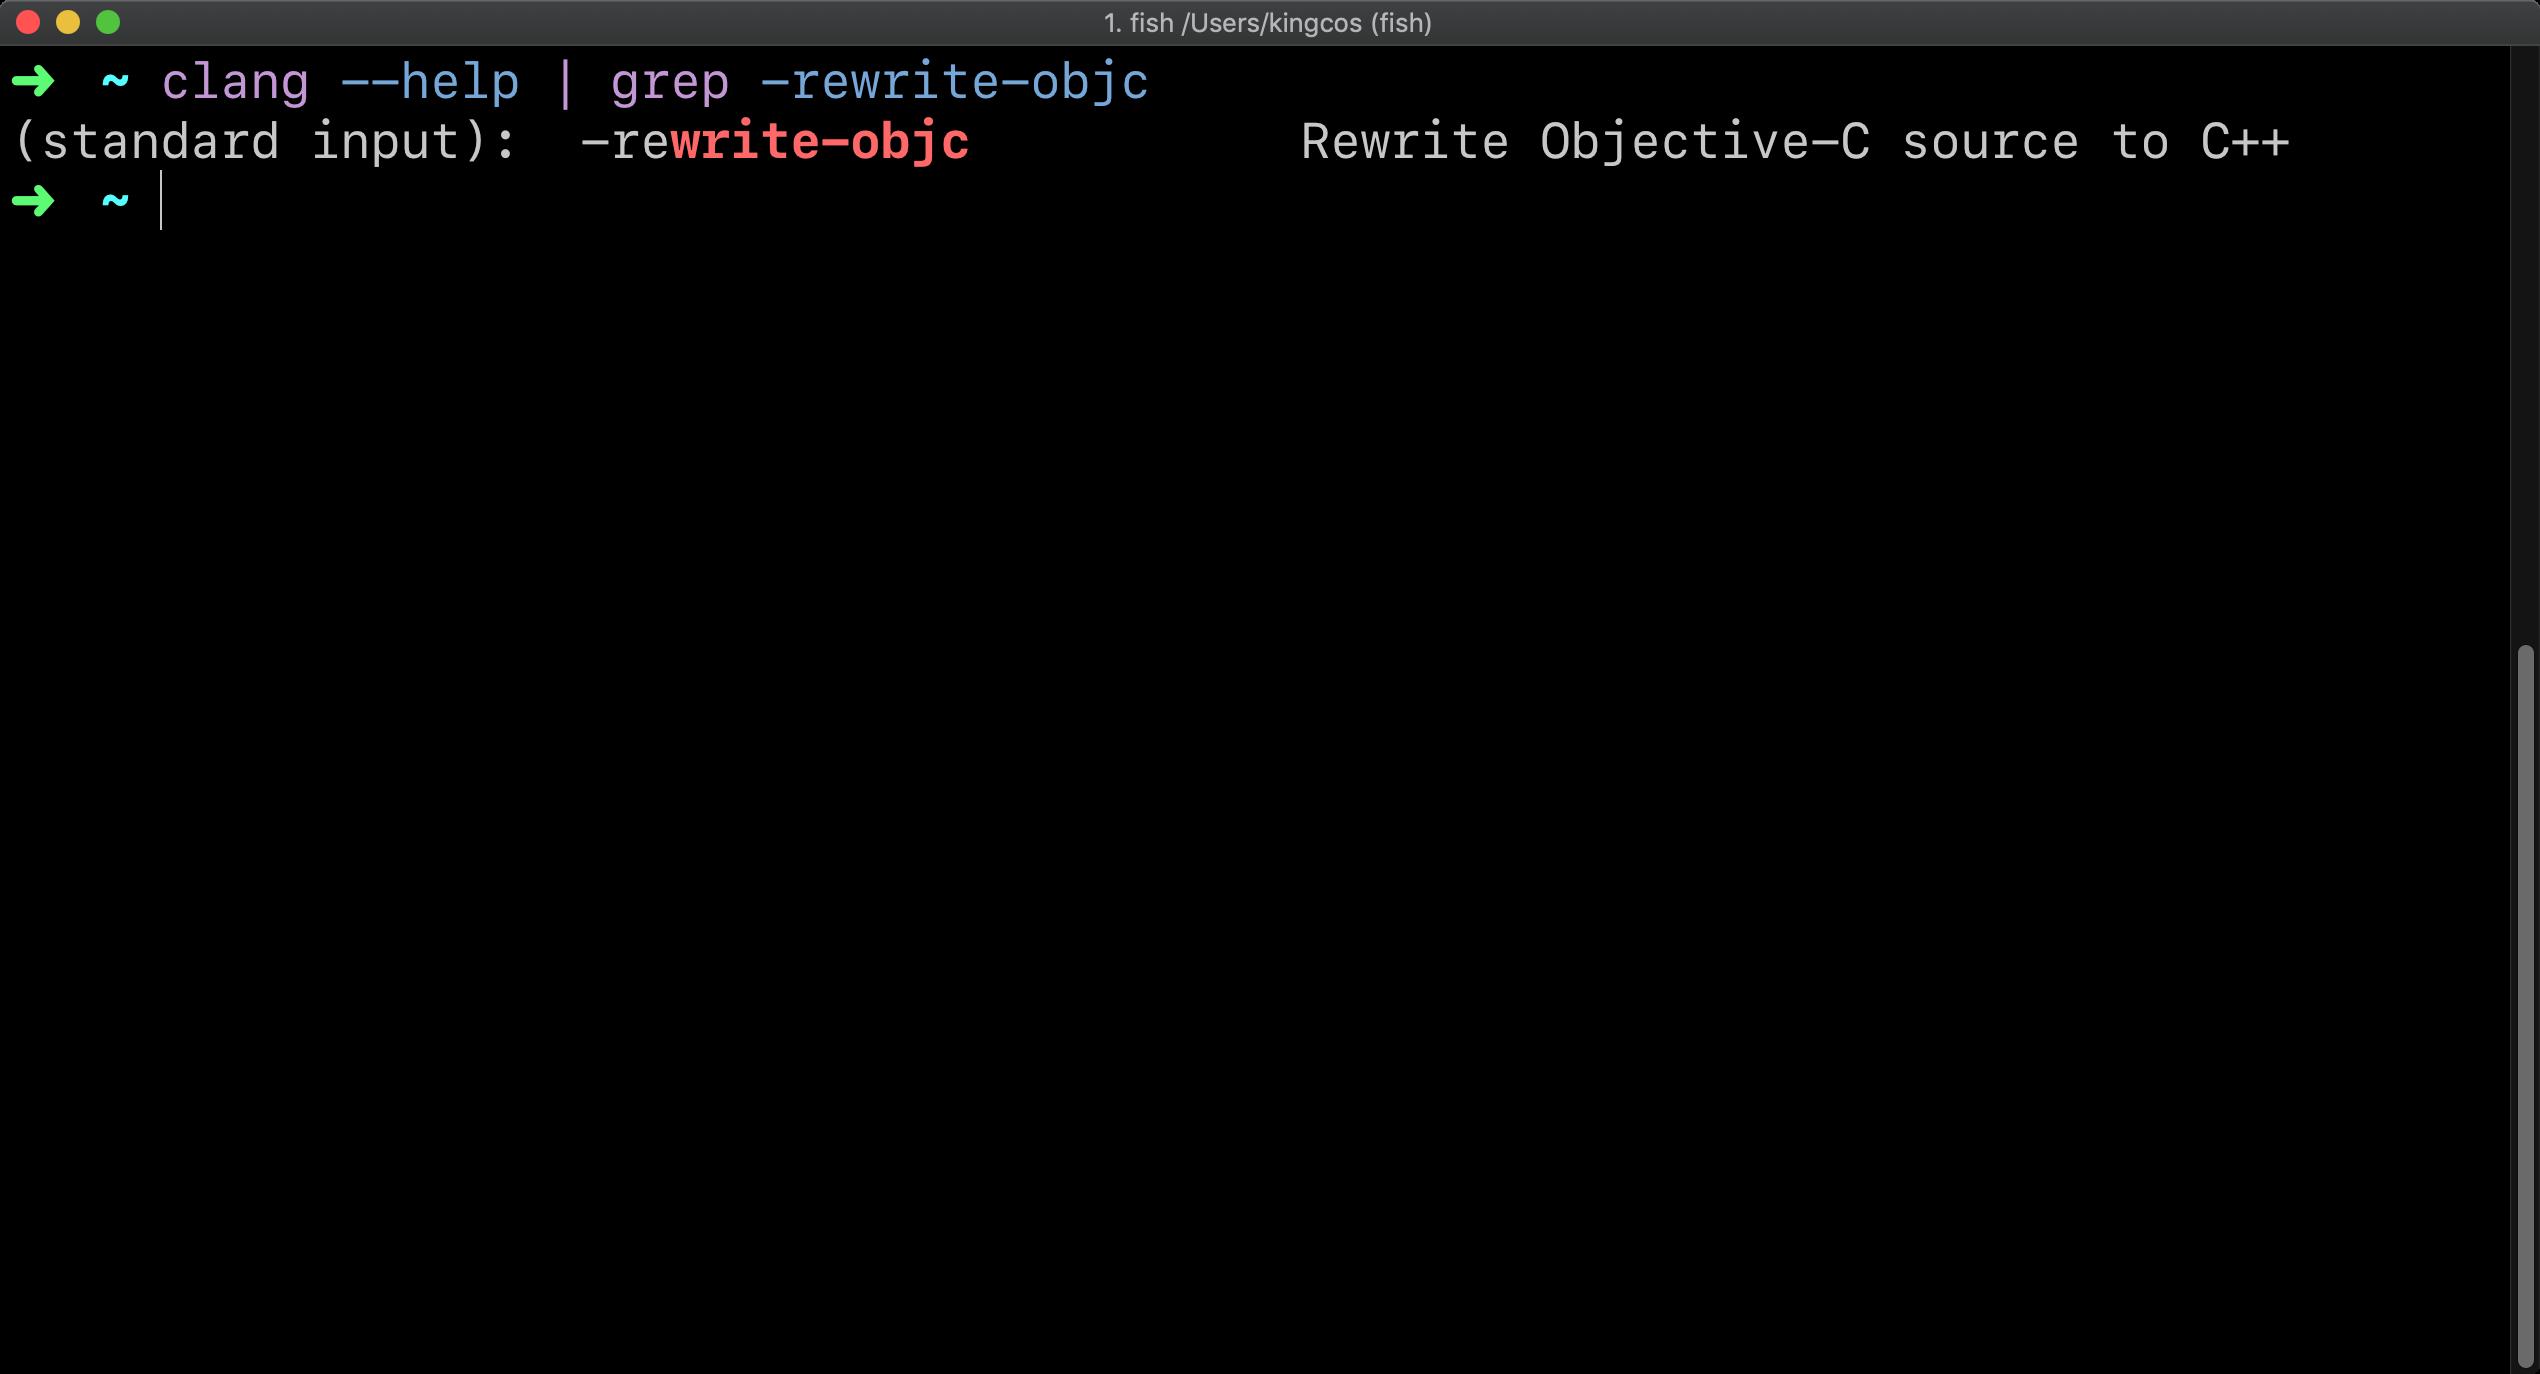 clang --help | grep -rewrite-objc